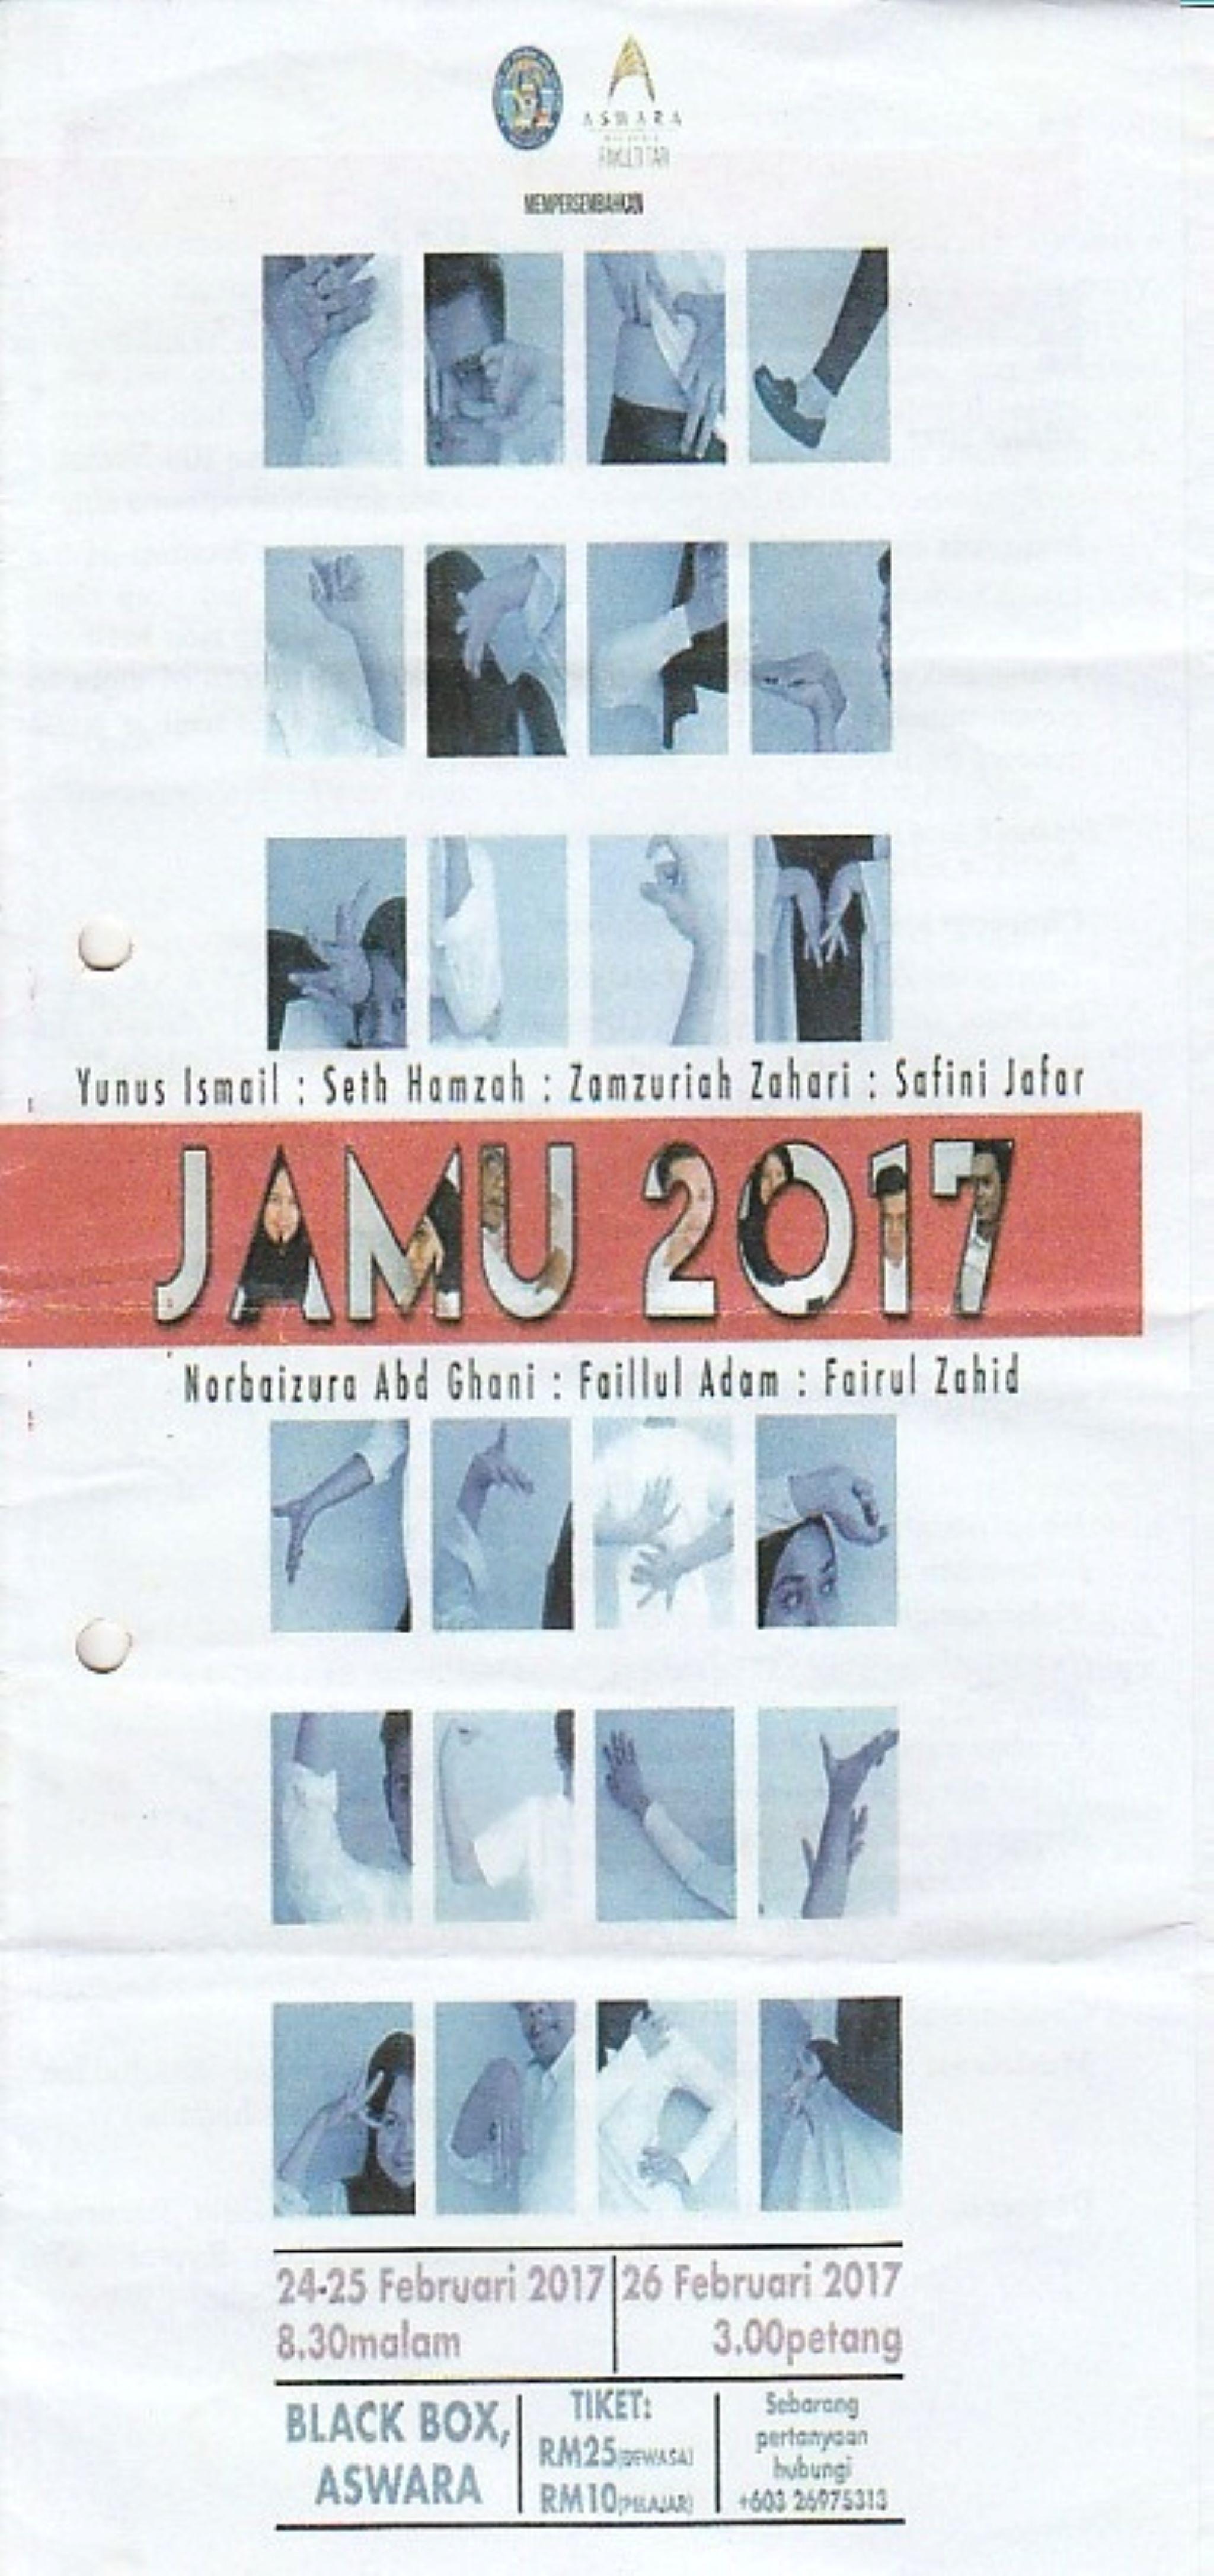 2017 Jamu Cover